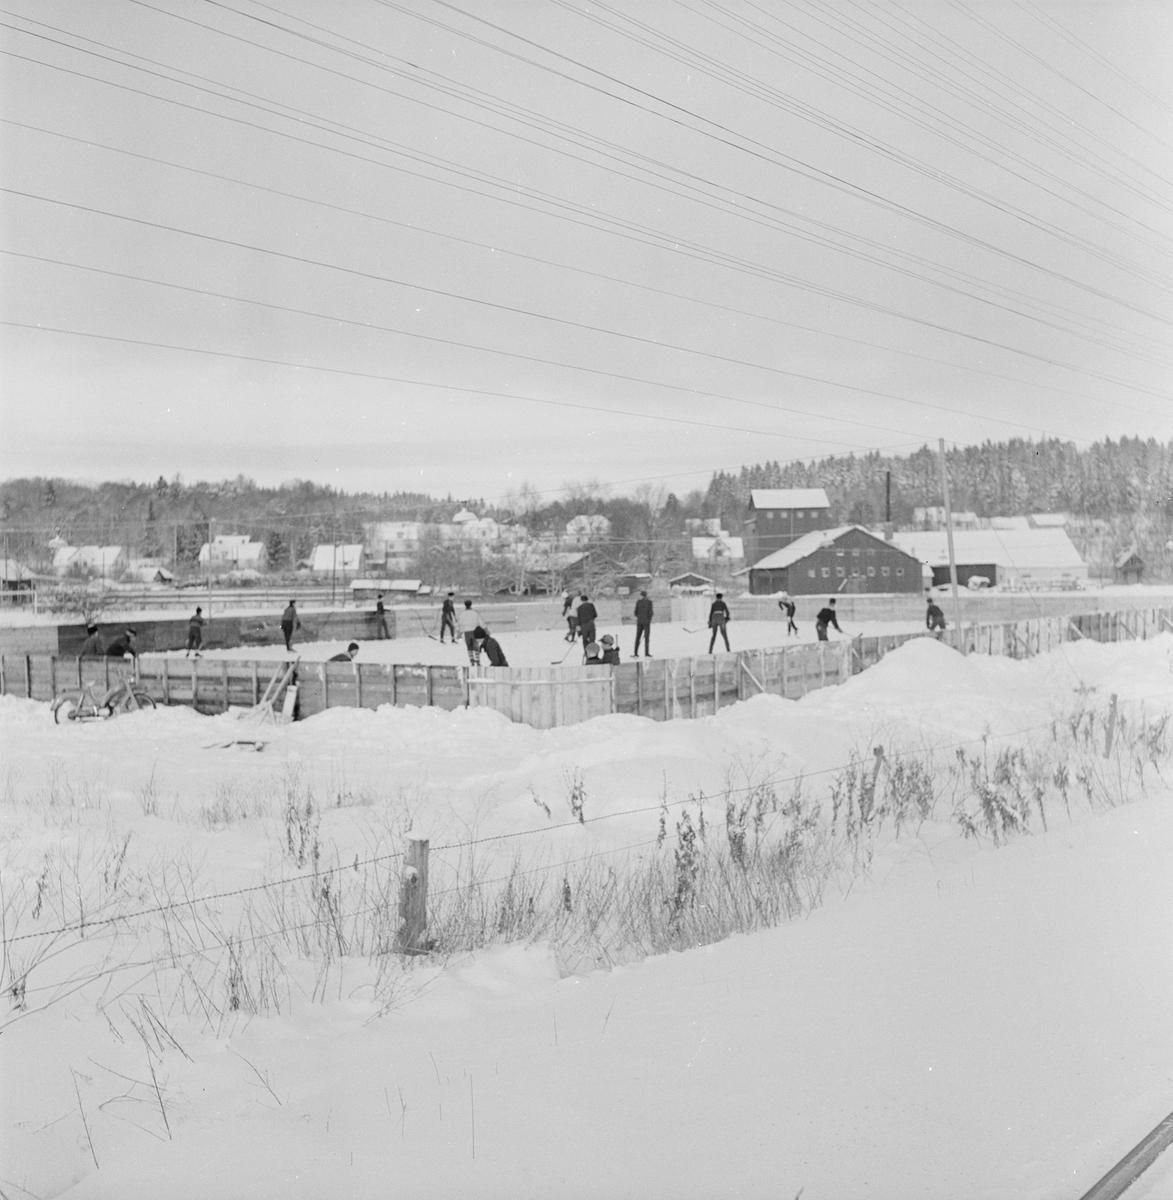 Ishockeyplan, Uppland 1959